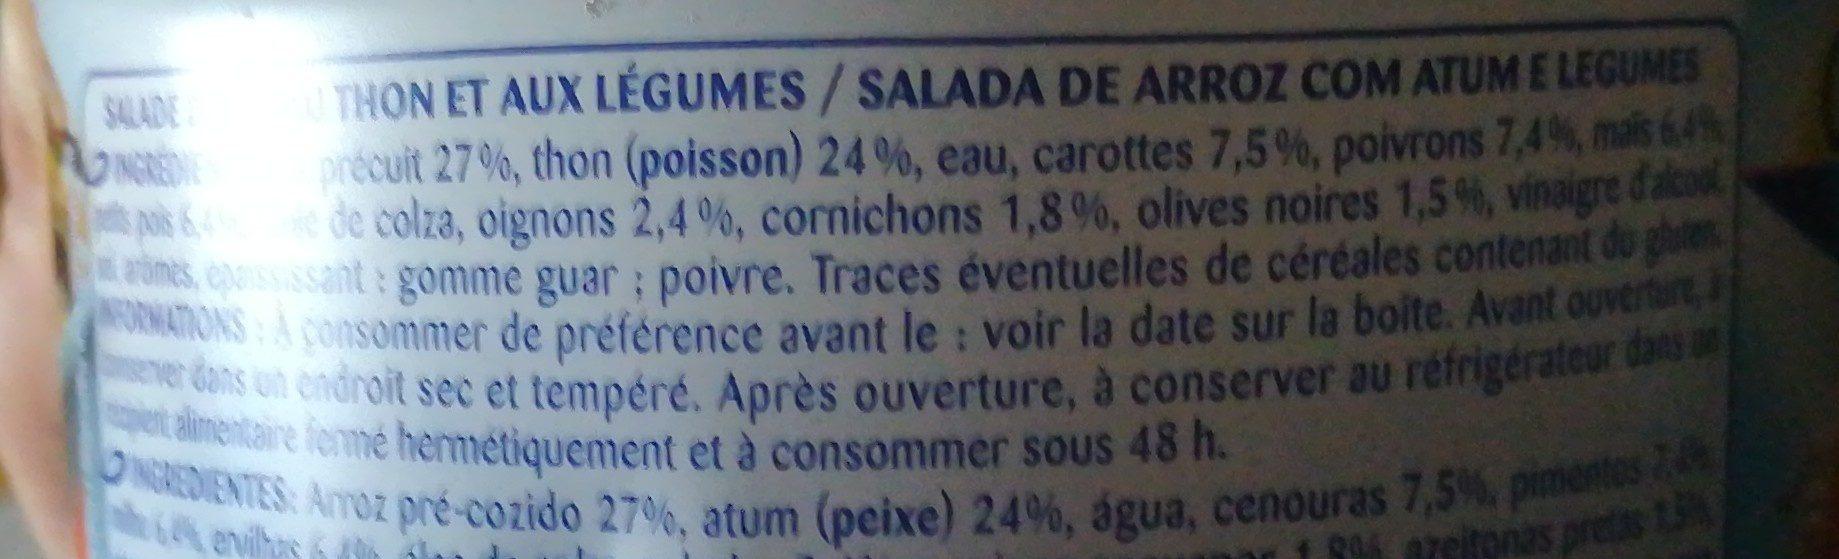 Salade au Thon/Riz Méditerranéenne - Ingrédients